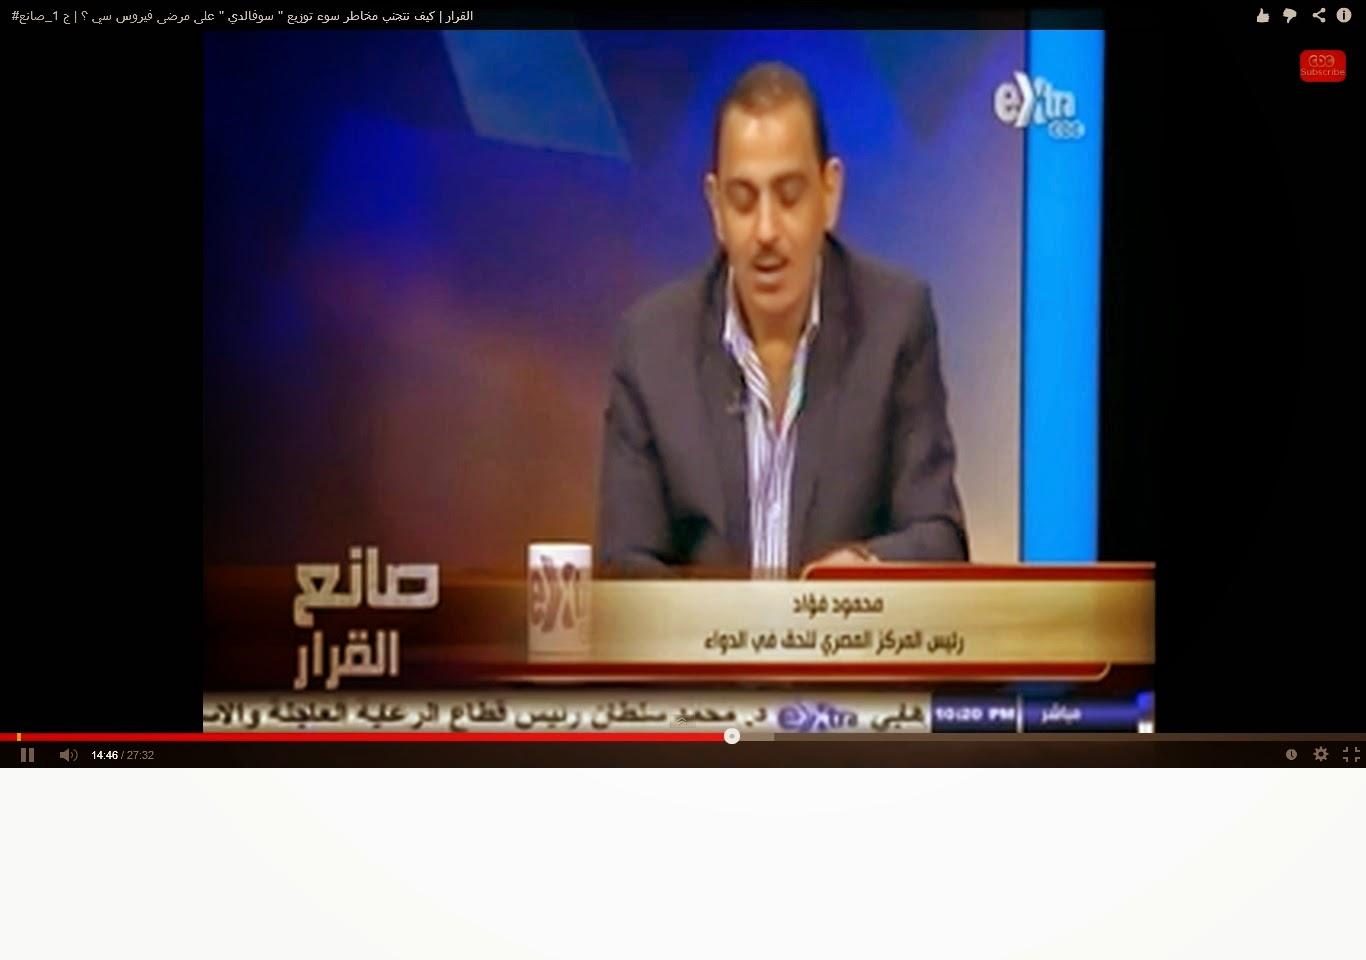 Mahmoud Fouad,محمود فؤاد , المركز المصرى للحق فى الدواء , ابن سينا ,  بيزنس الكبد فى مصر , علاج فيروس سى , مرضى الكبد بالمنوفية,#harvoni , #sovaldi , #سوفالدى